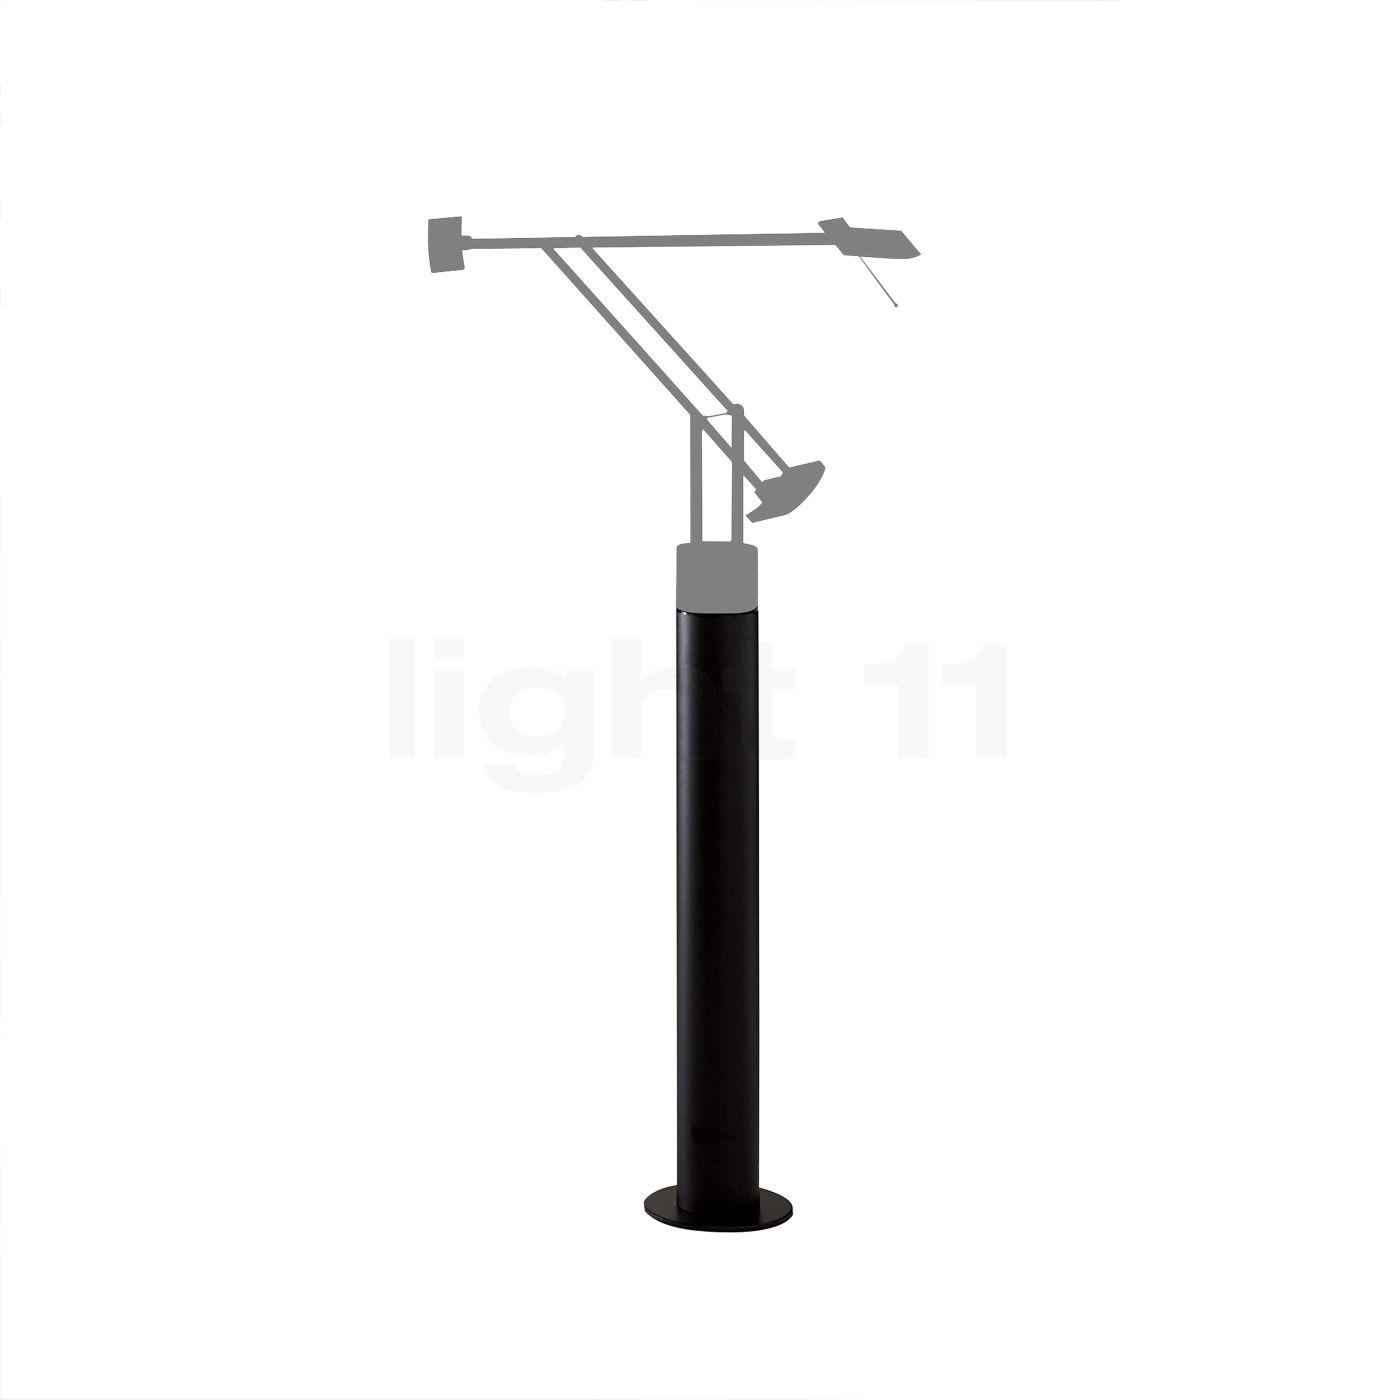 Buy Artemide Floor Support For Tizio 35 At Light11 Eu